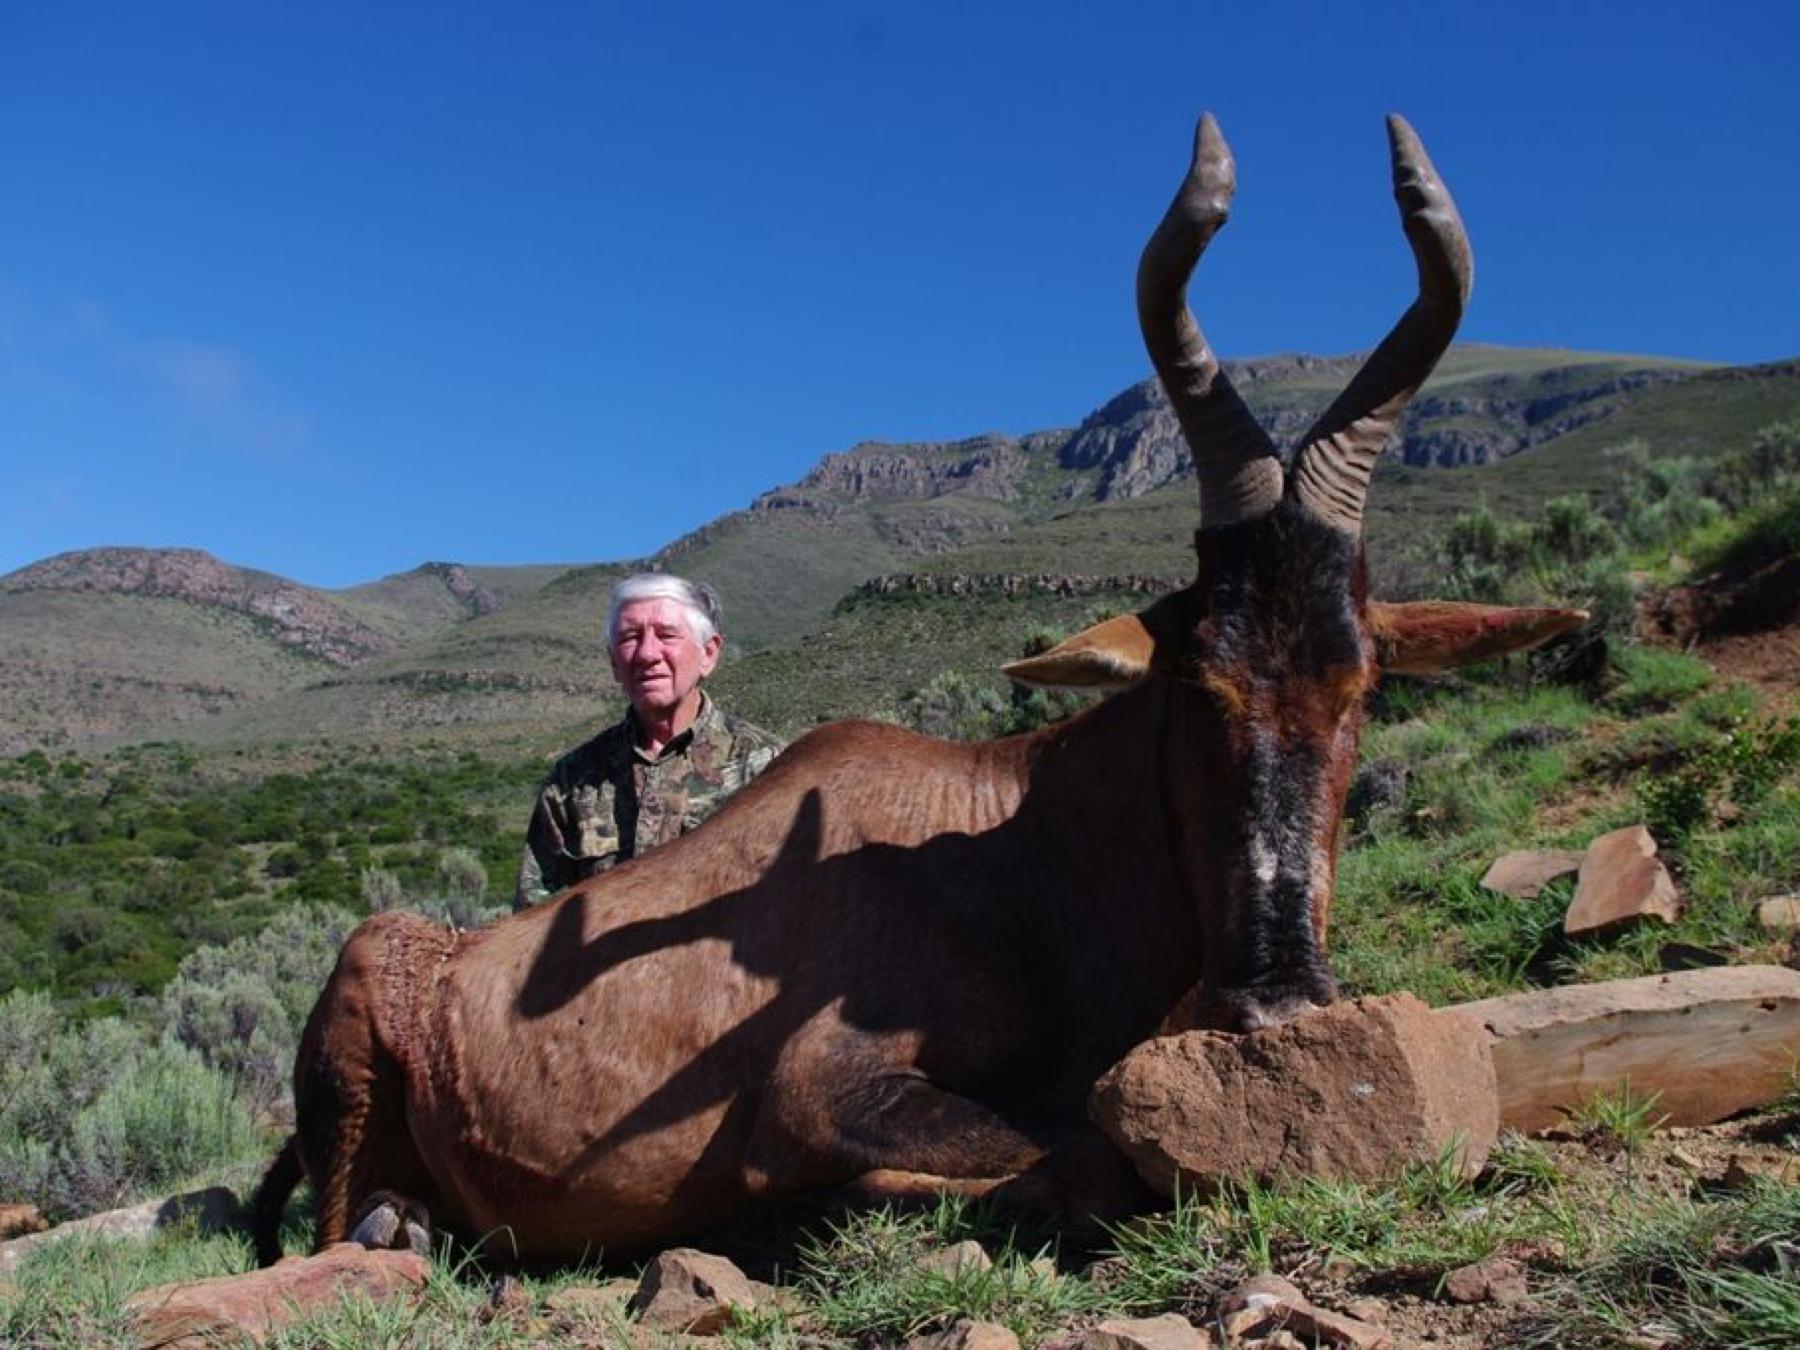 karoo-wild-safaris-32.jpg